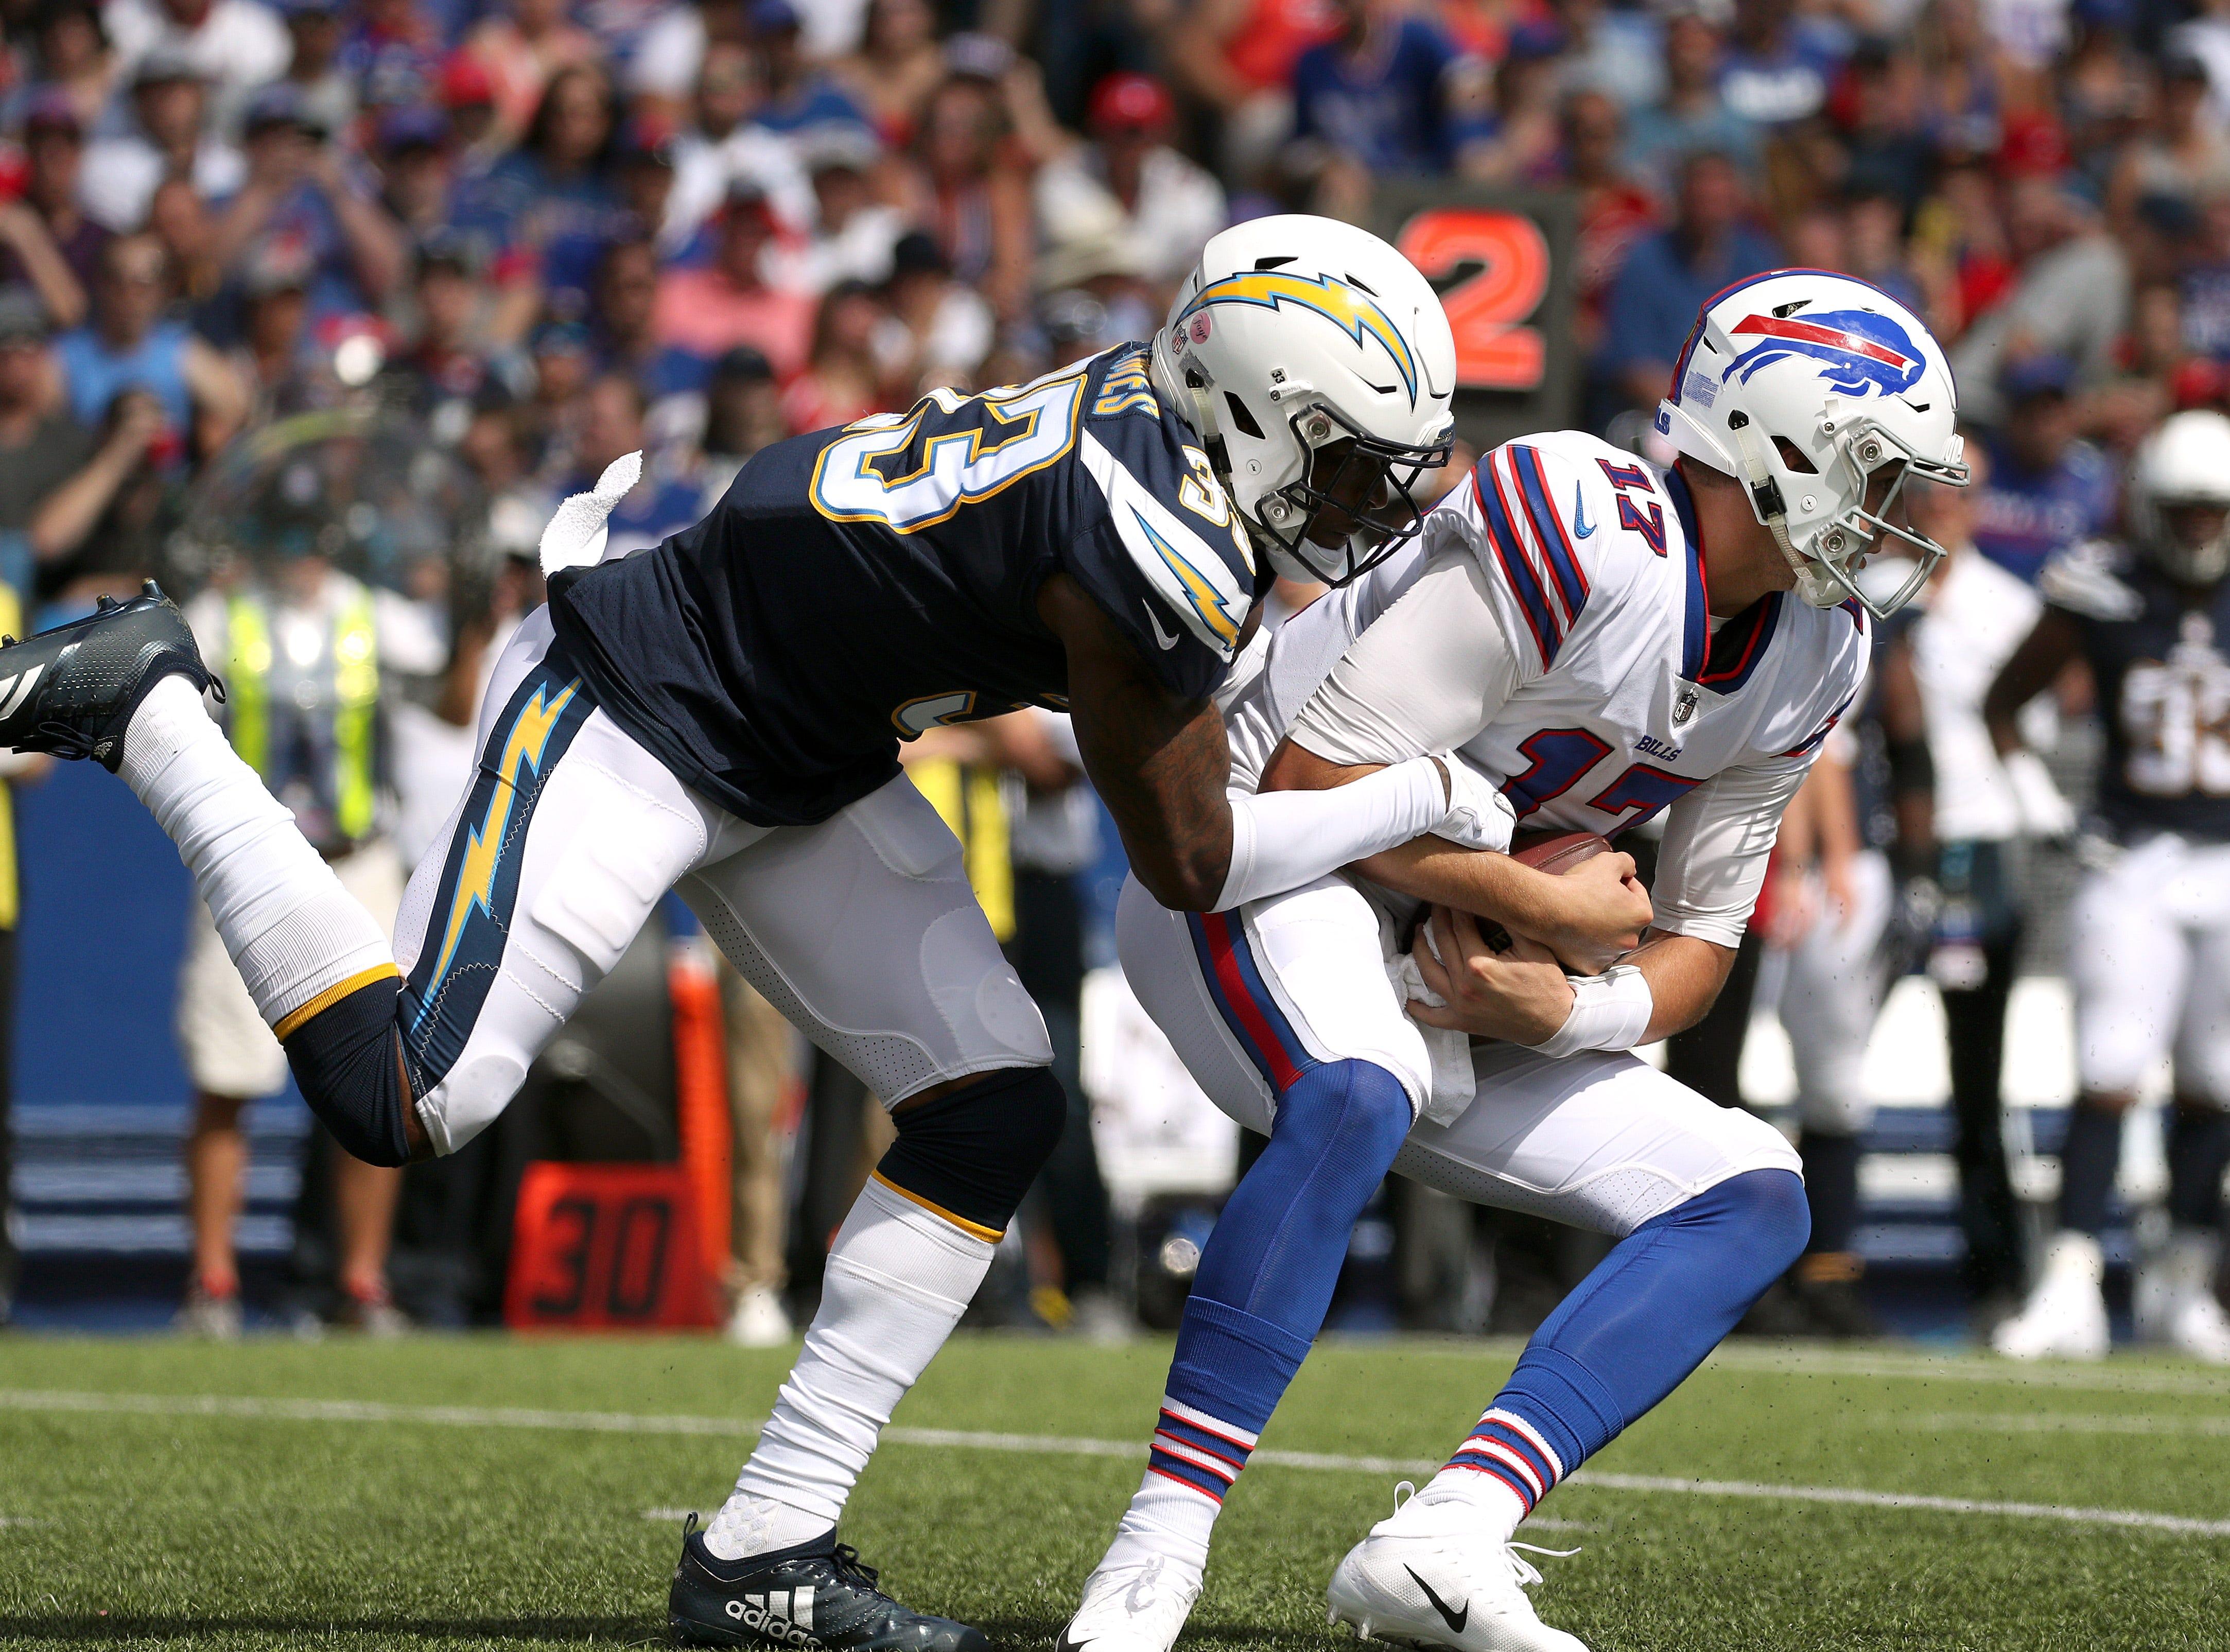 Bills quarterback Josh Allen is sacked by the Chargers' Derwin James.